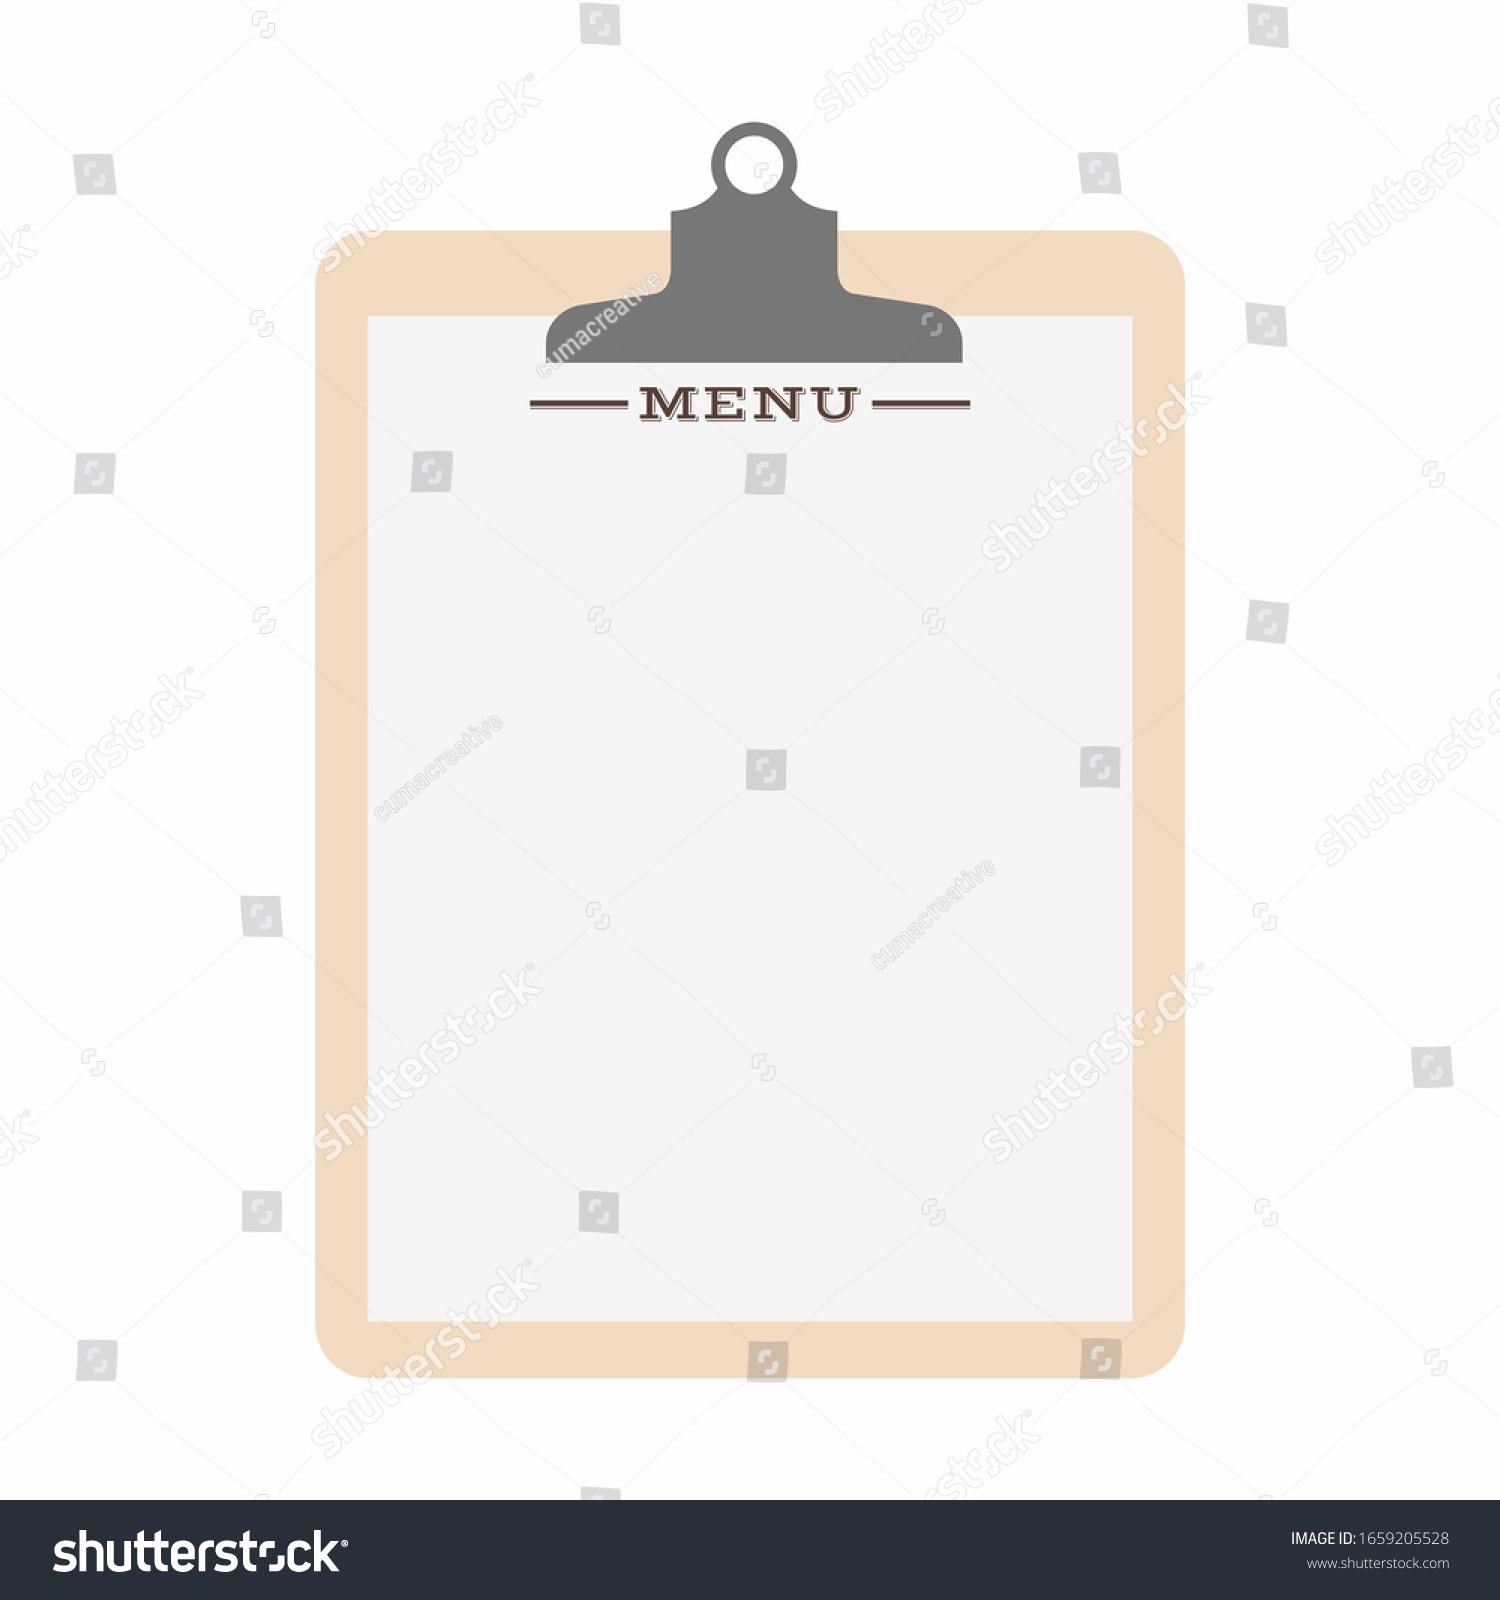 009 Surprising Blank Restaurant Menu Template Inspiration  Free Printable DownloadableFull